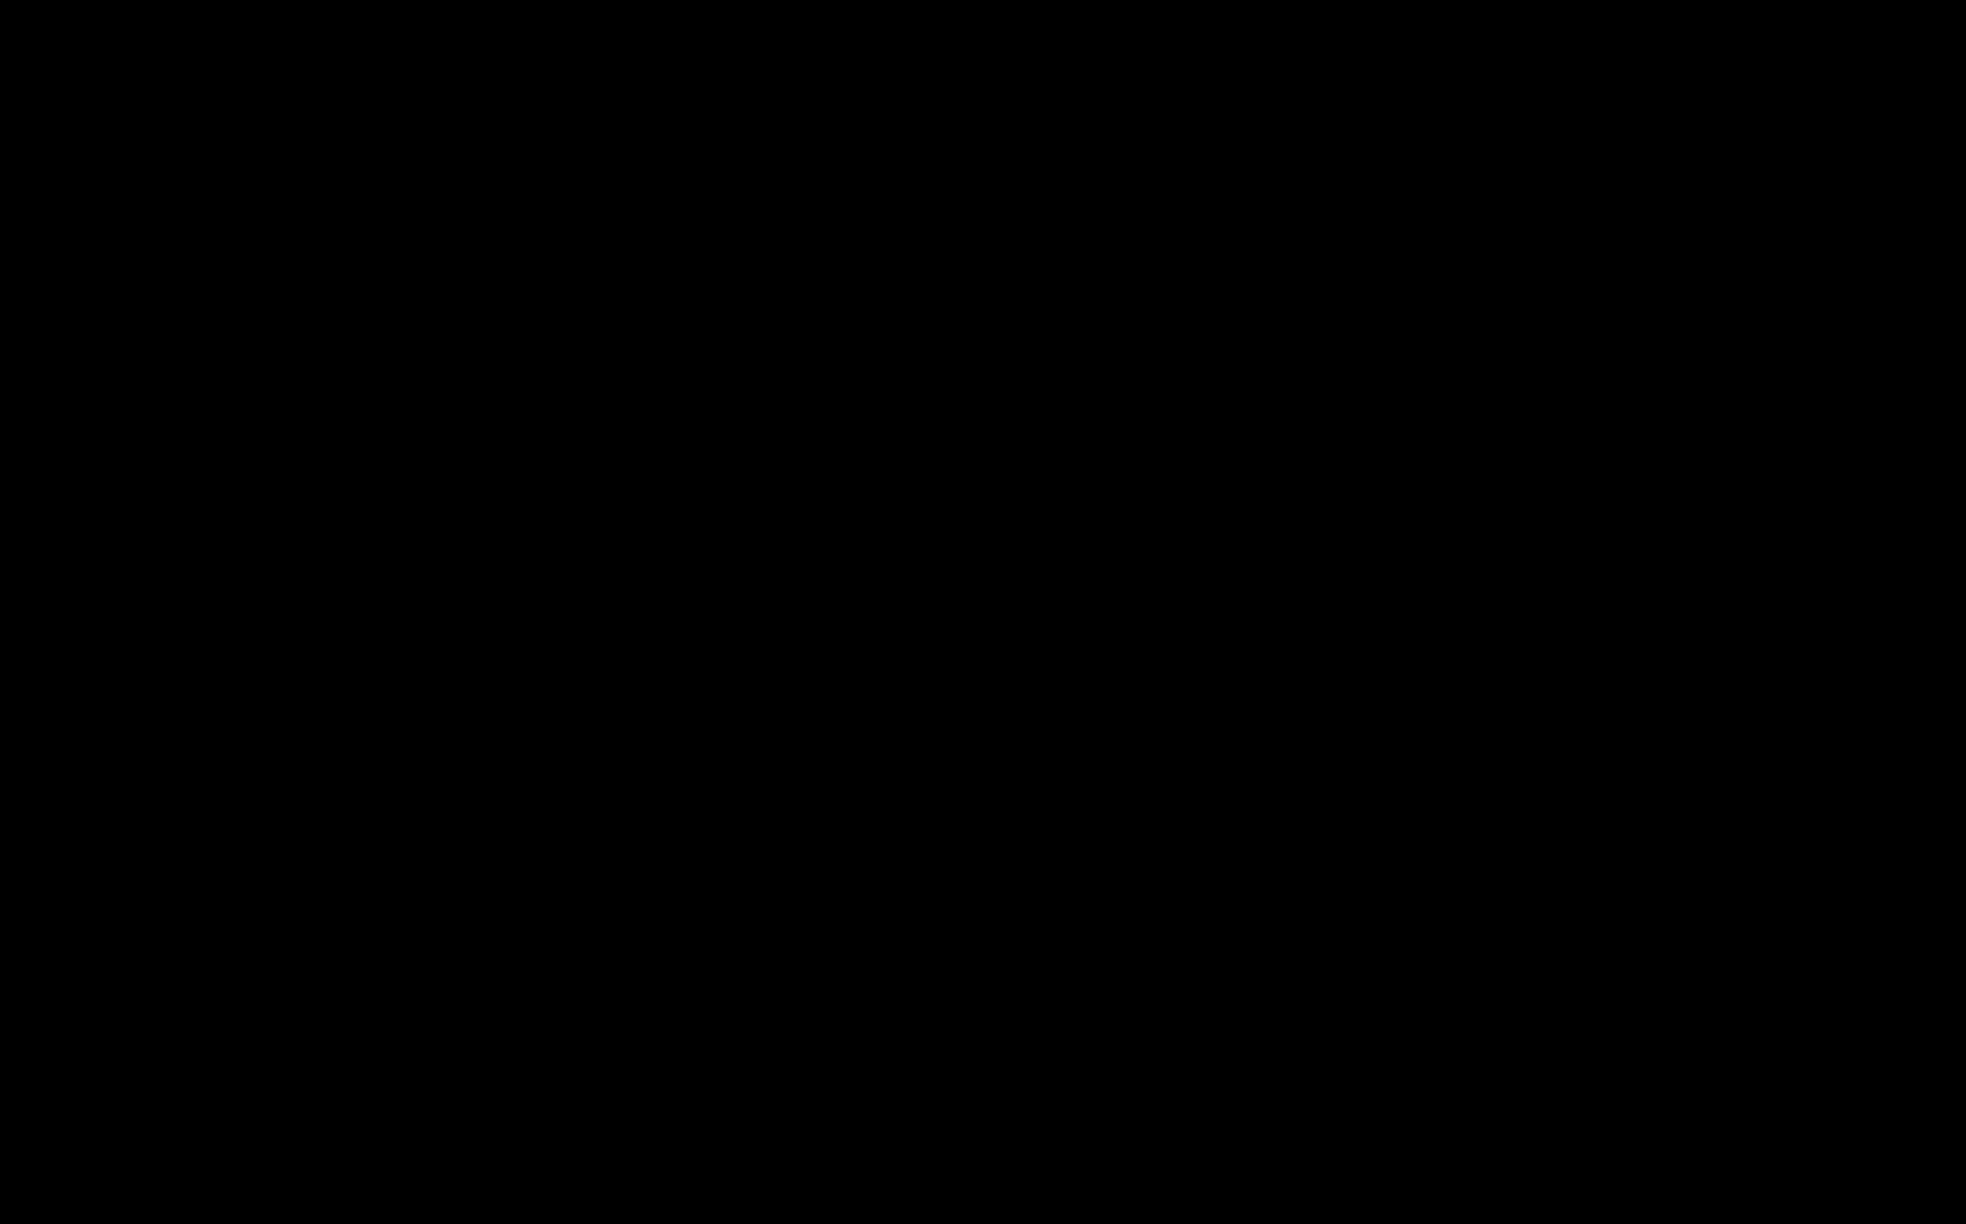 2-[4-(Boc-amino)-1-piperidinyl]pyridine-5-boronic acid pinacol ester